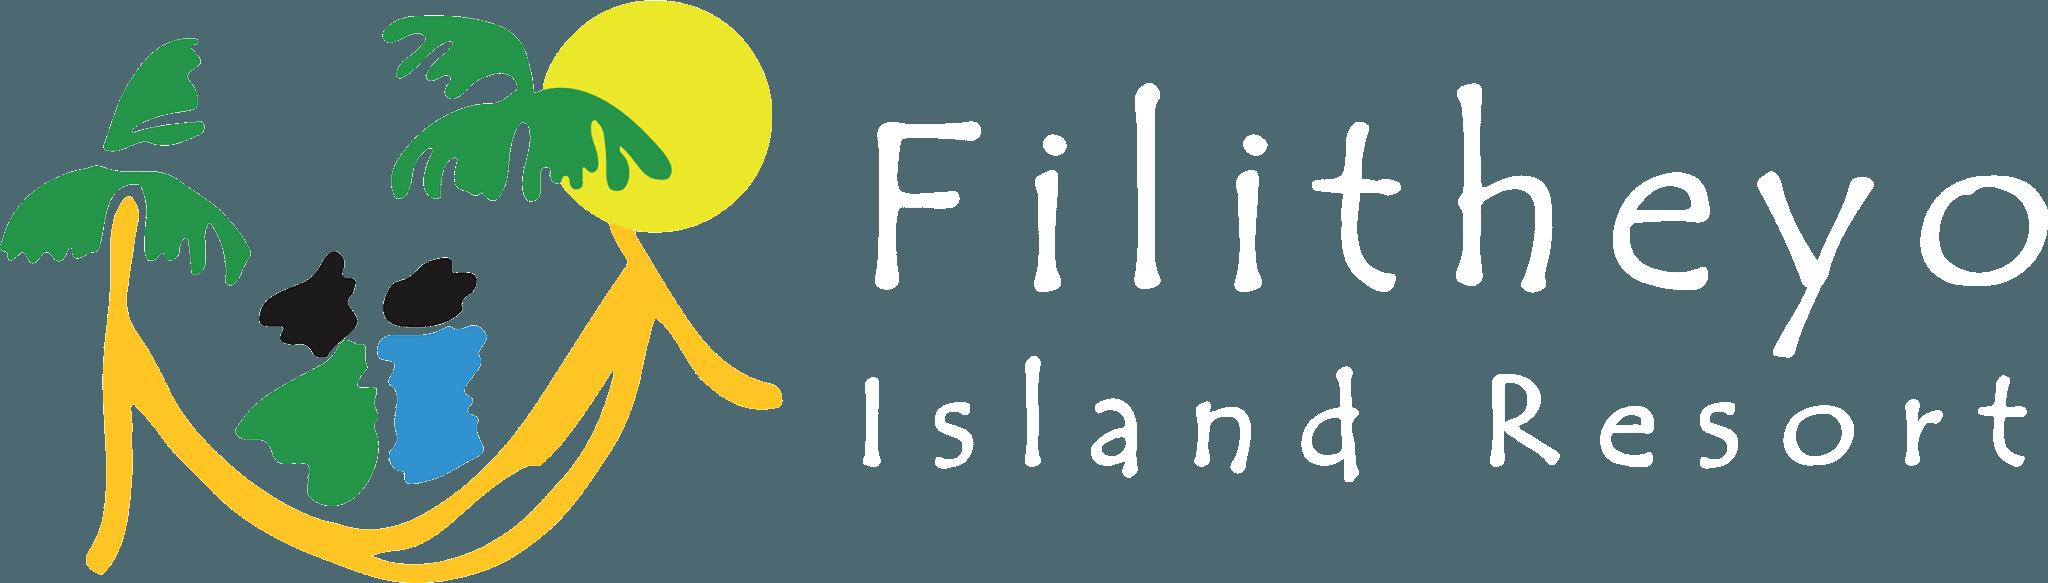 Maldives Resort | Filitheyo Island Resort & Spa | Official Site Logo